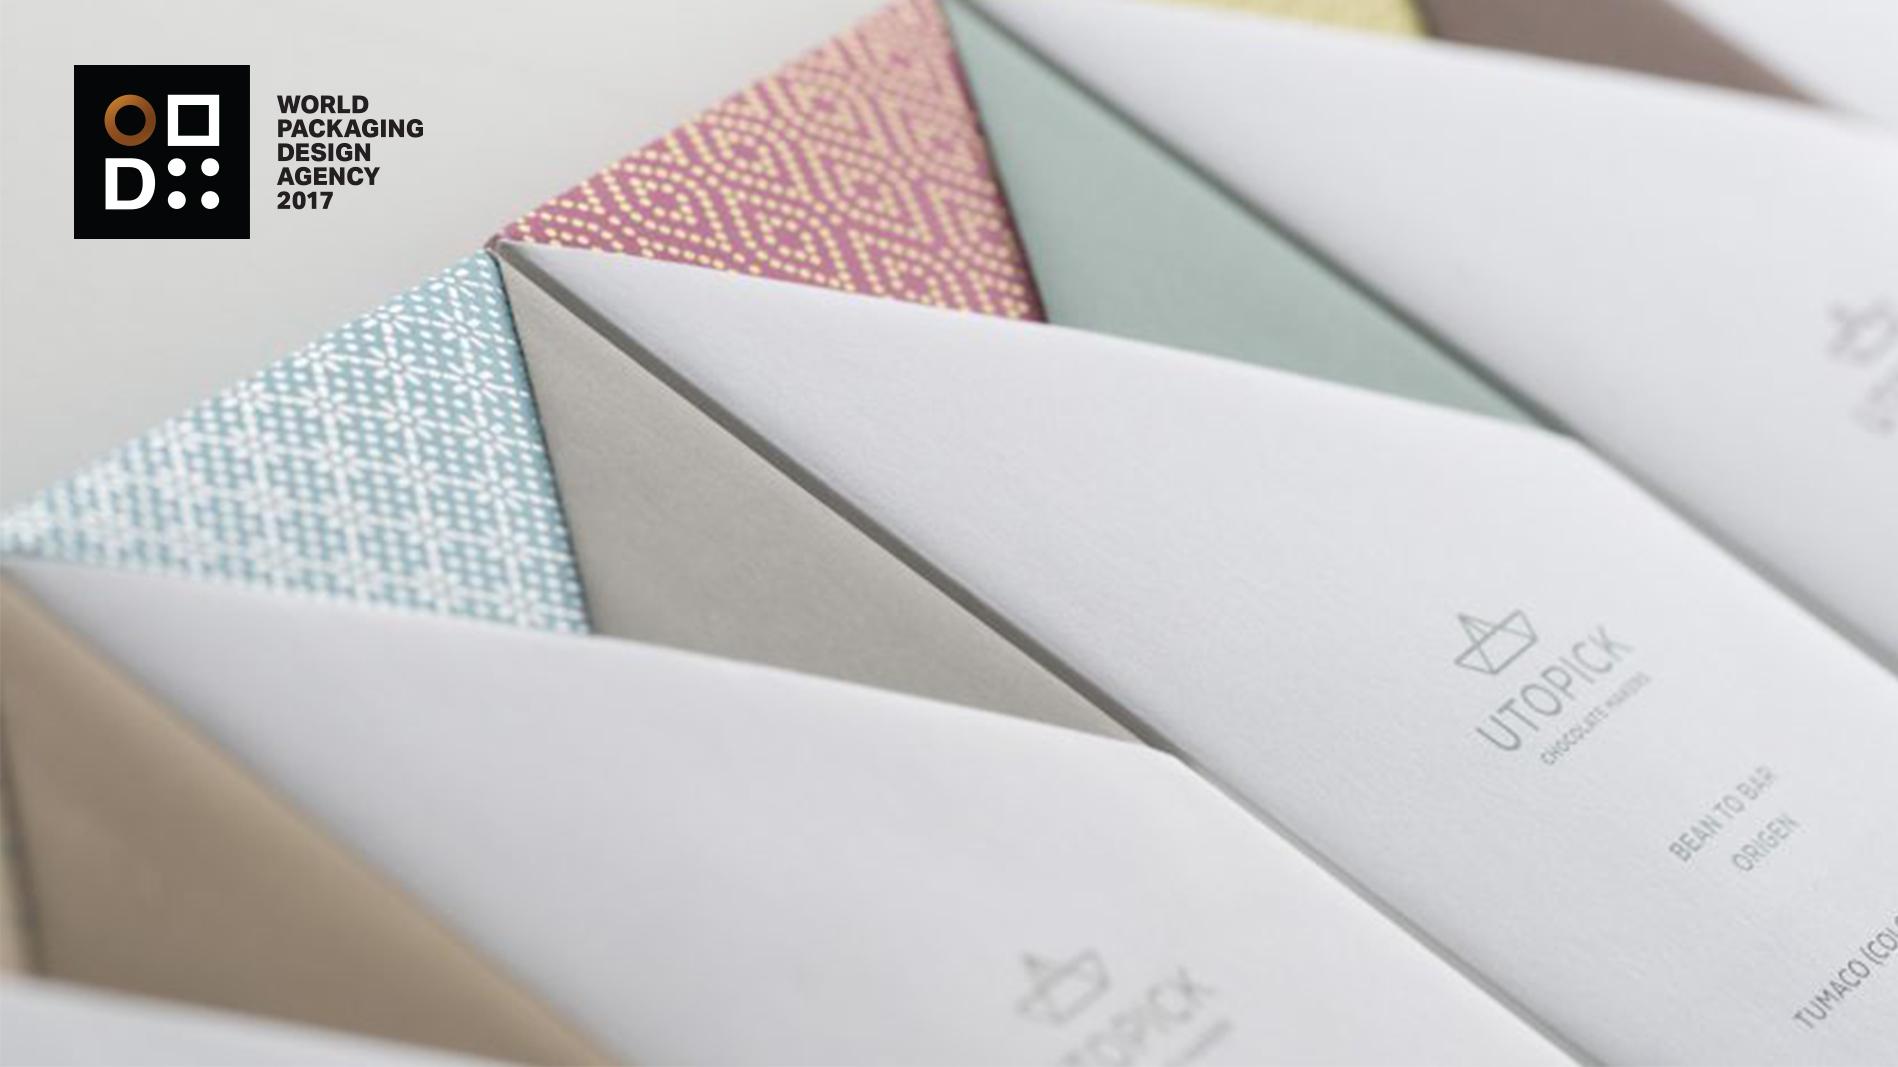 9-lavernia-and-cienfuegos-world-packaging-design-society.jpg